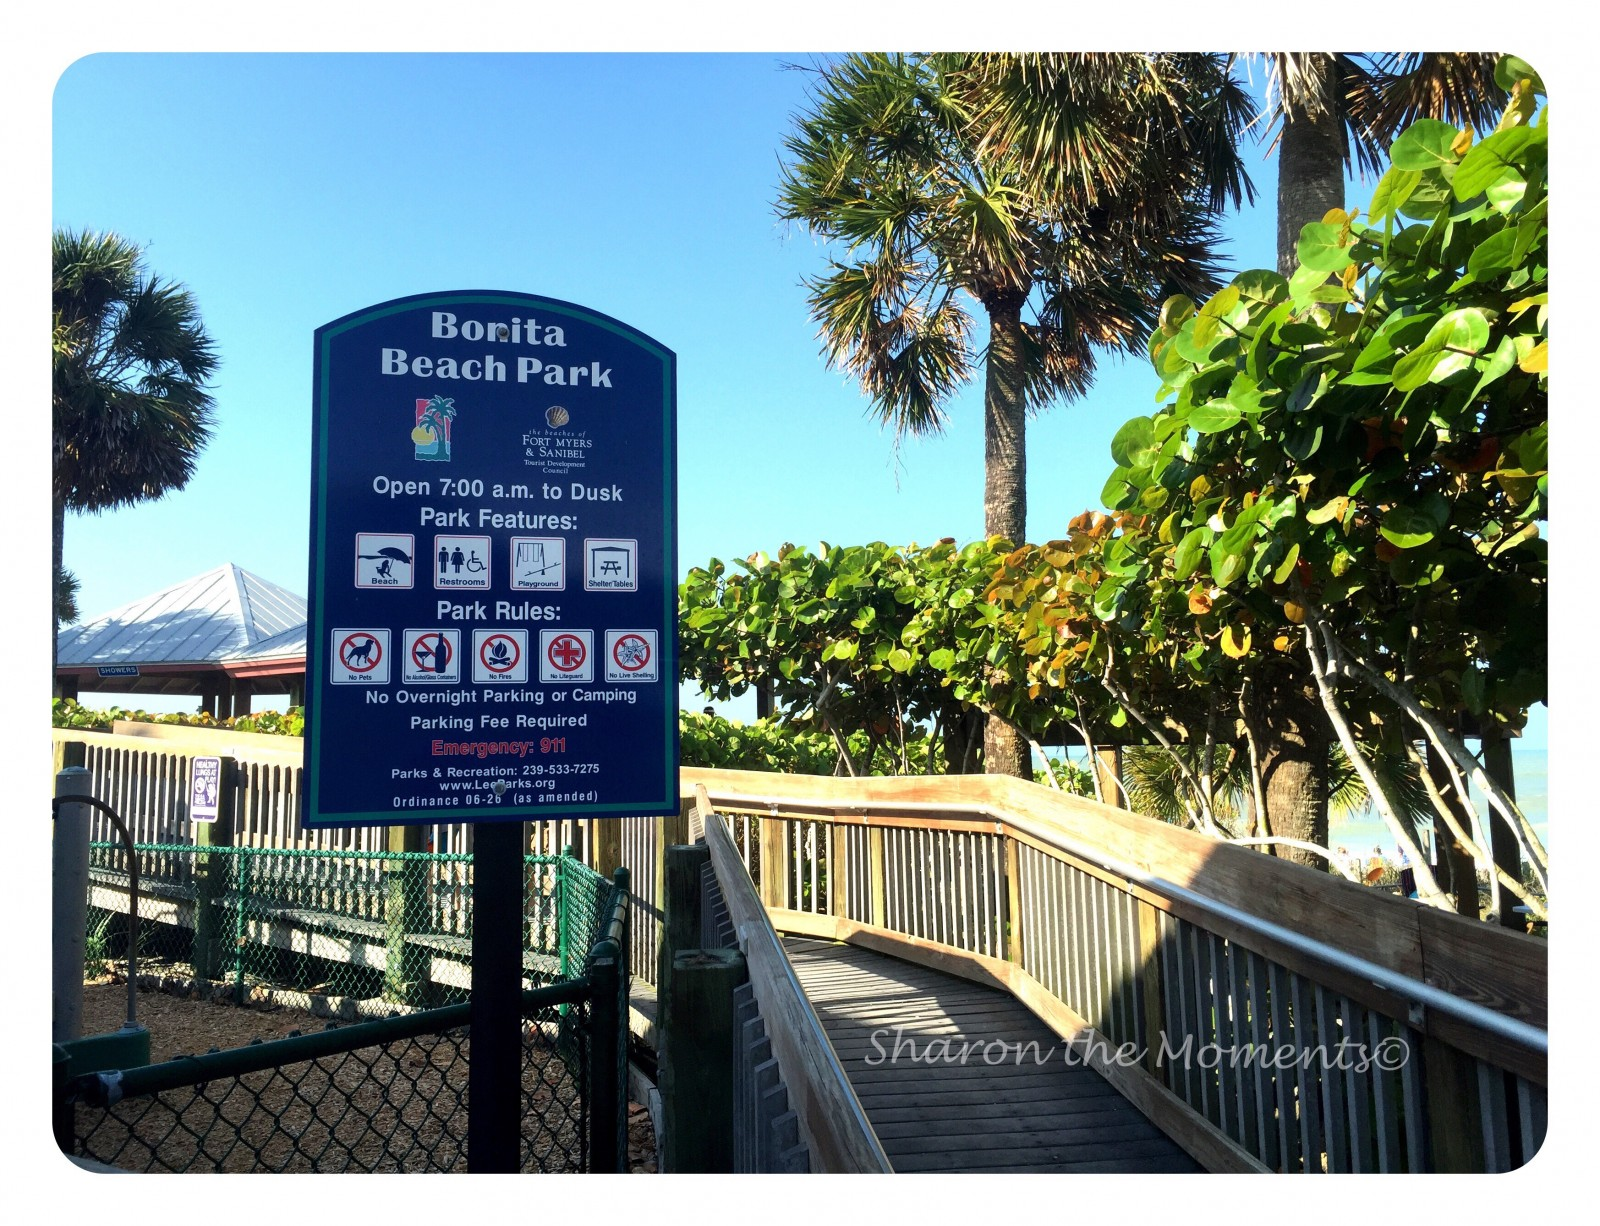 Bonita Beach Park | Sharon the Moments Blog